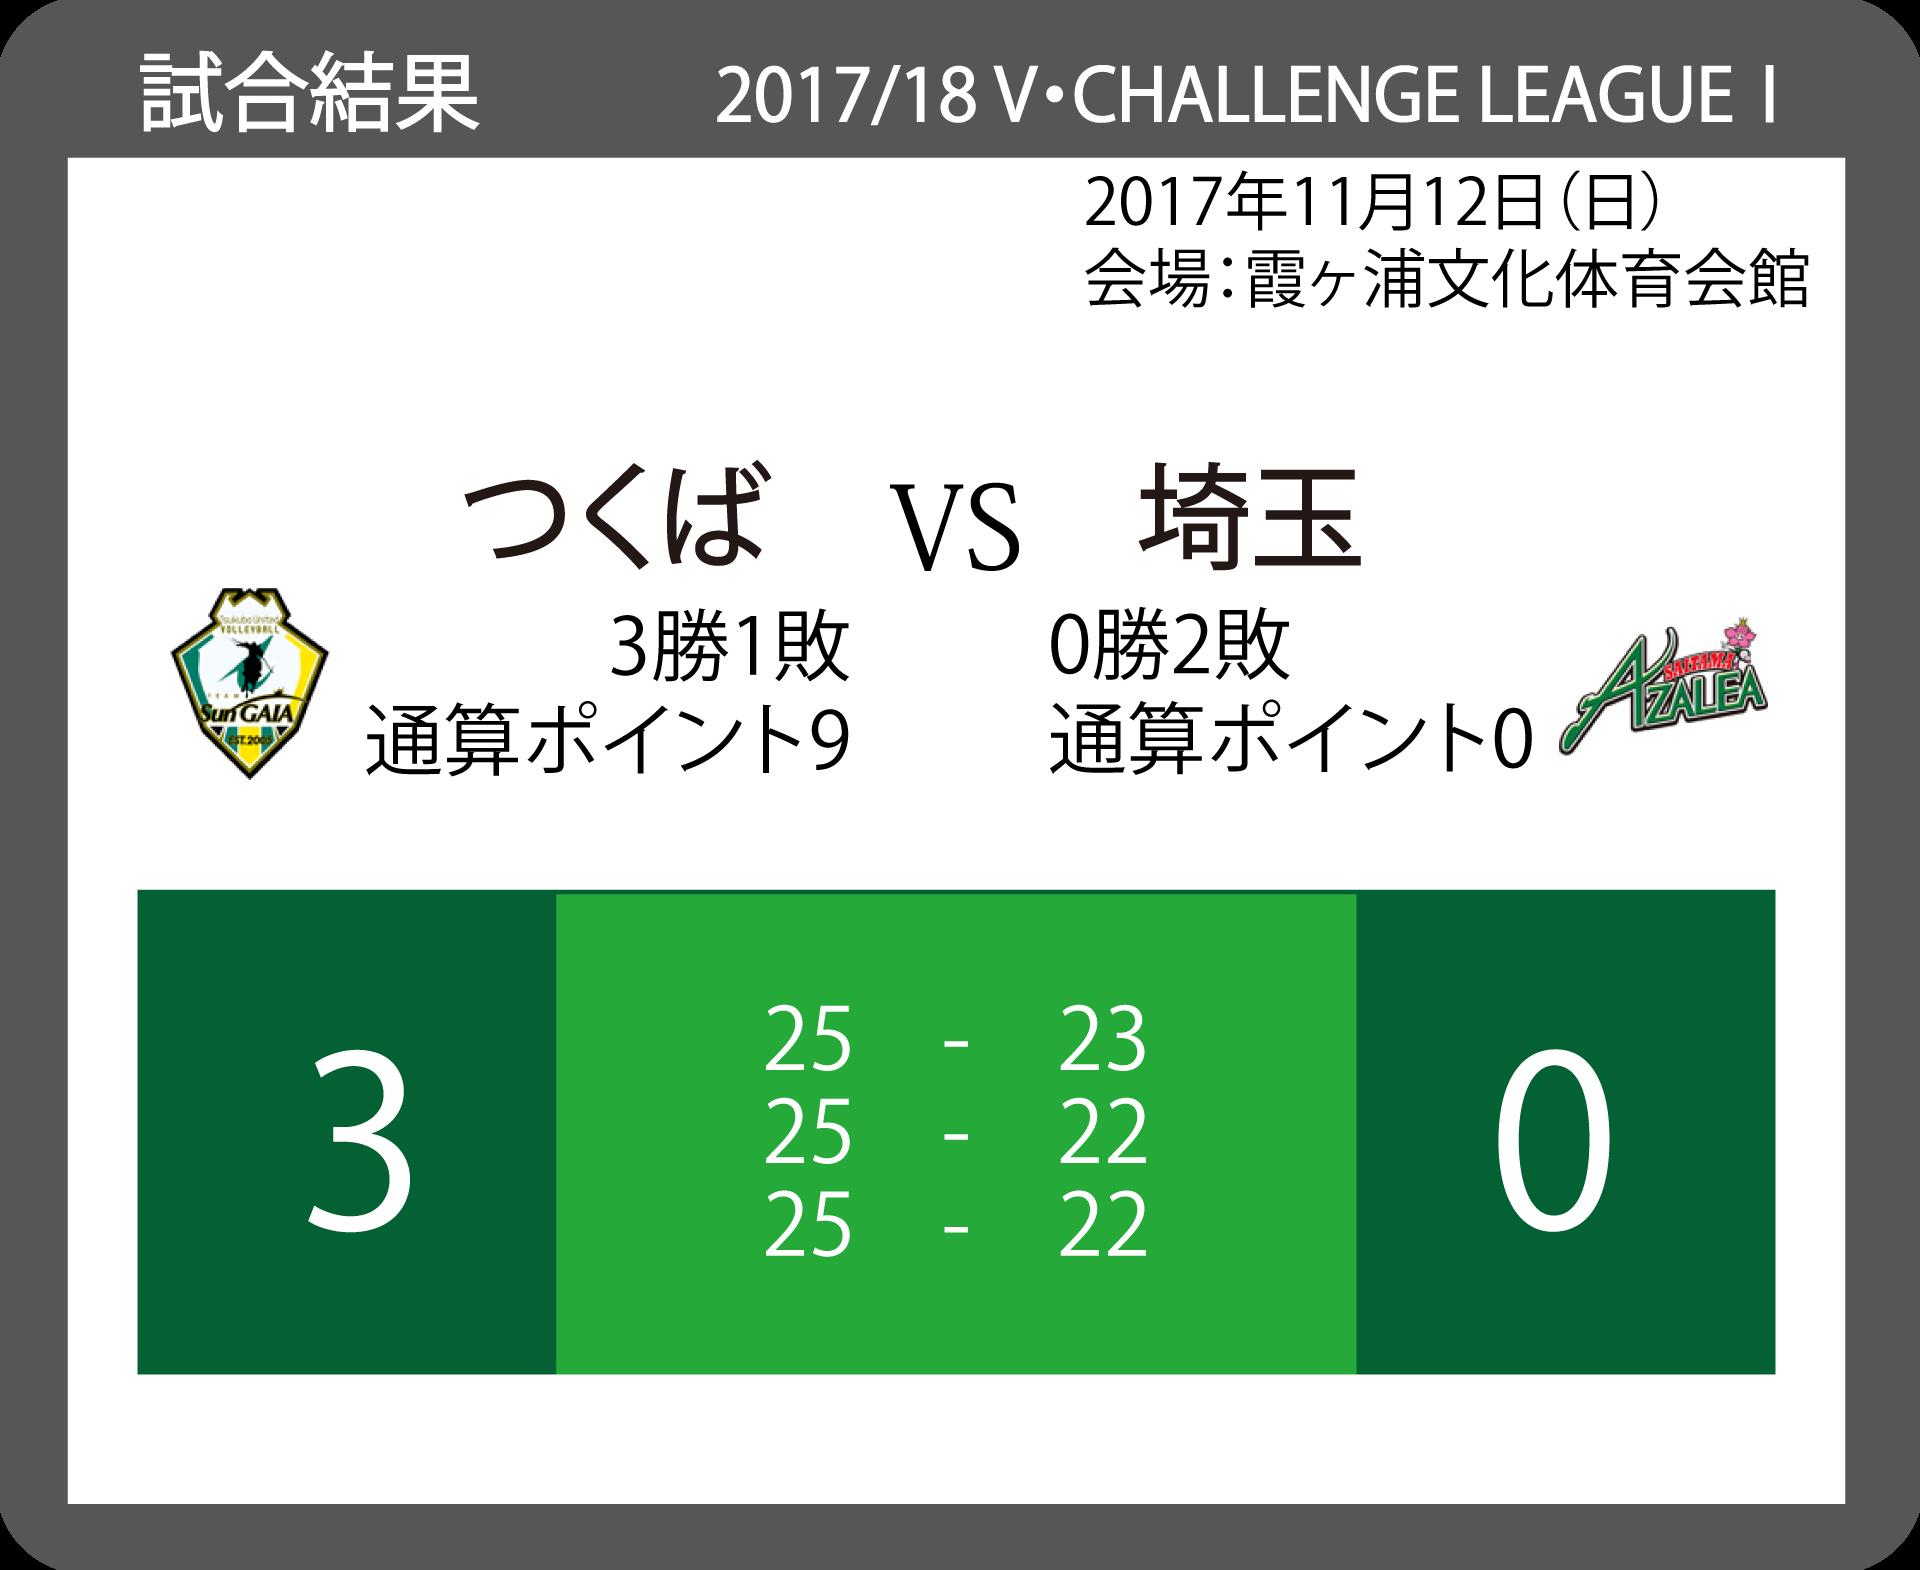 2017/18 V・チャレンジリーグⅠ 男子バレーボール 茨城大会 20171112_VS_埼玉アザレア